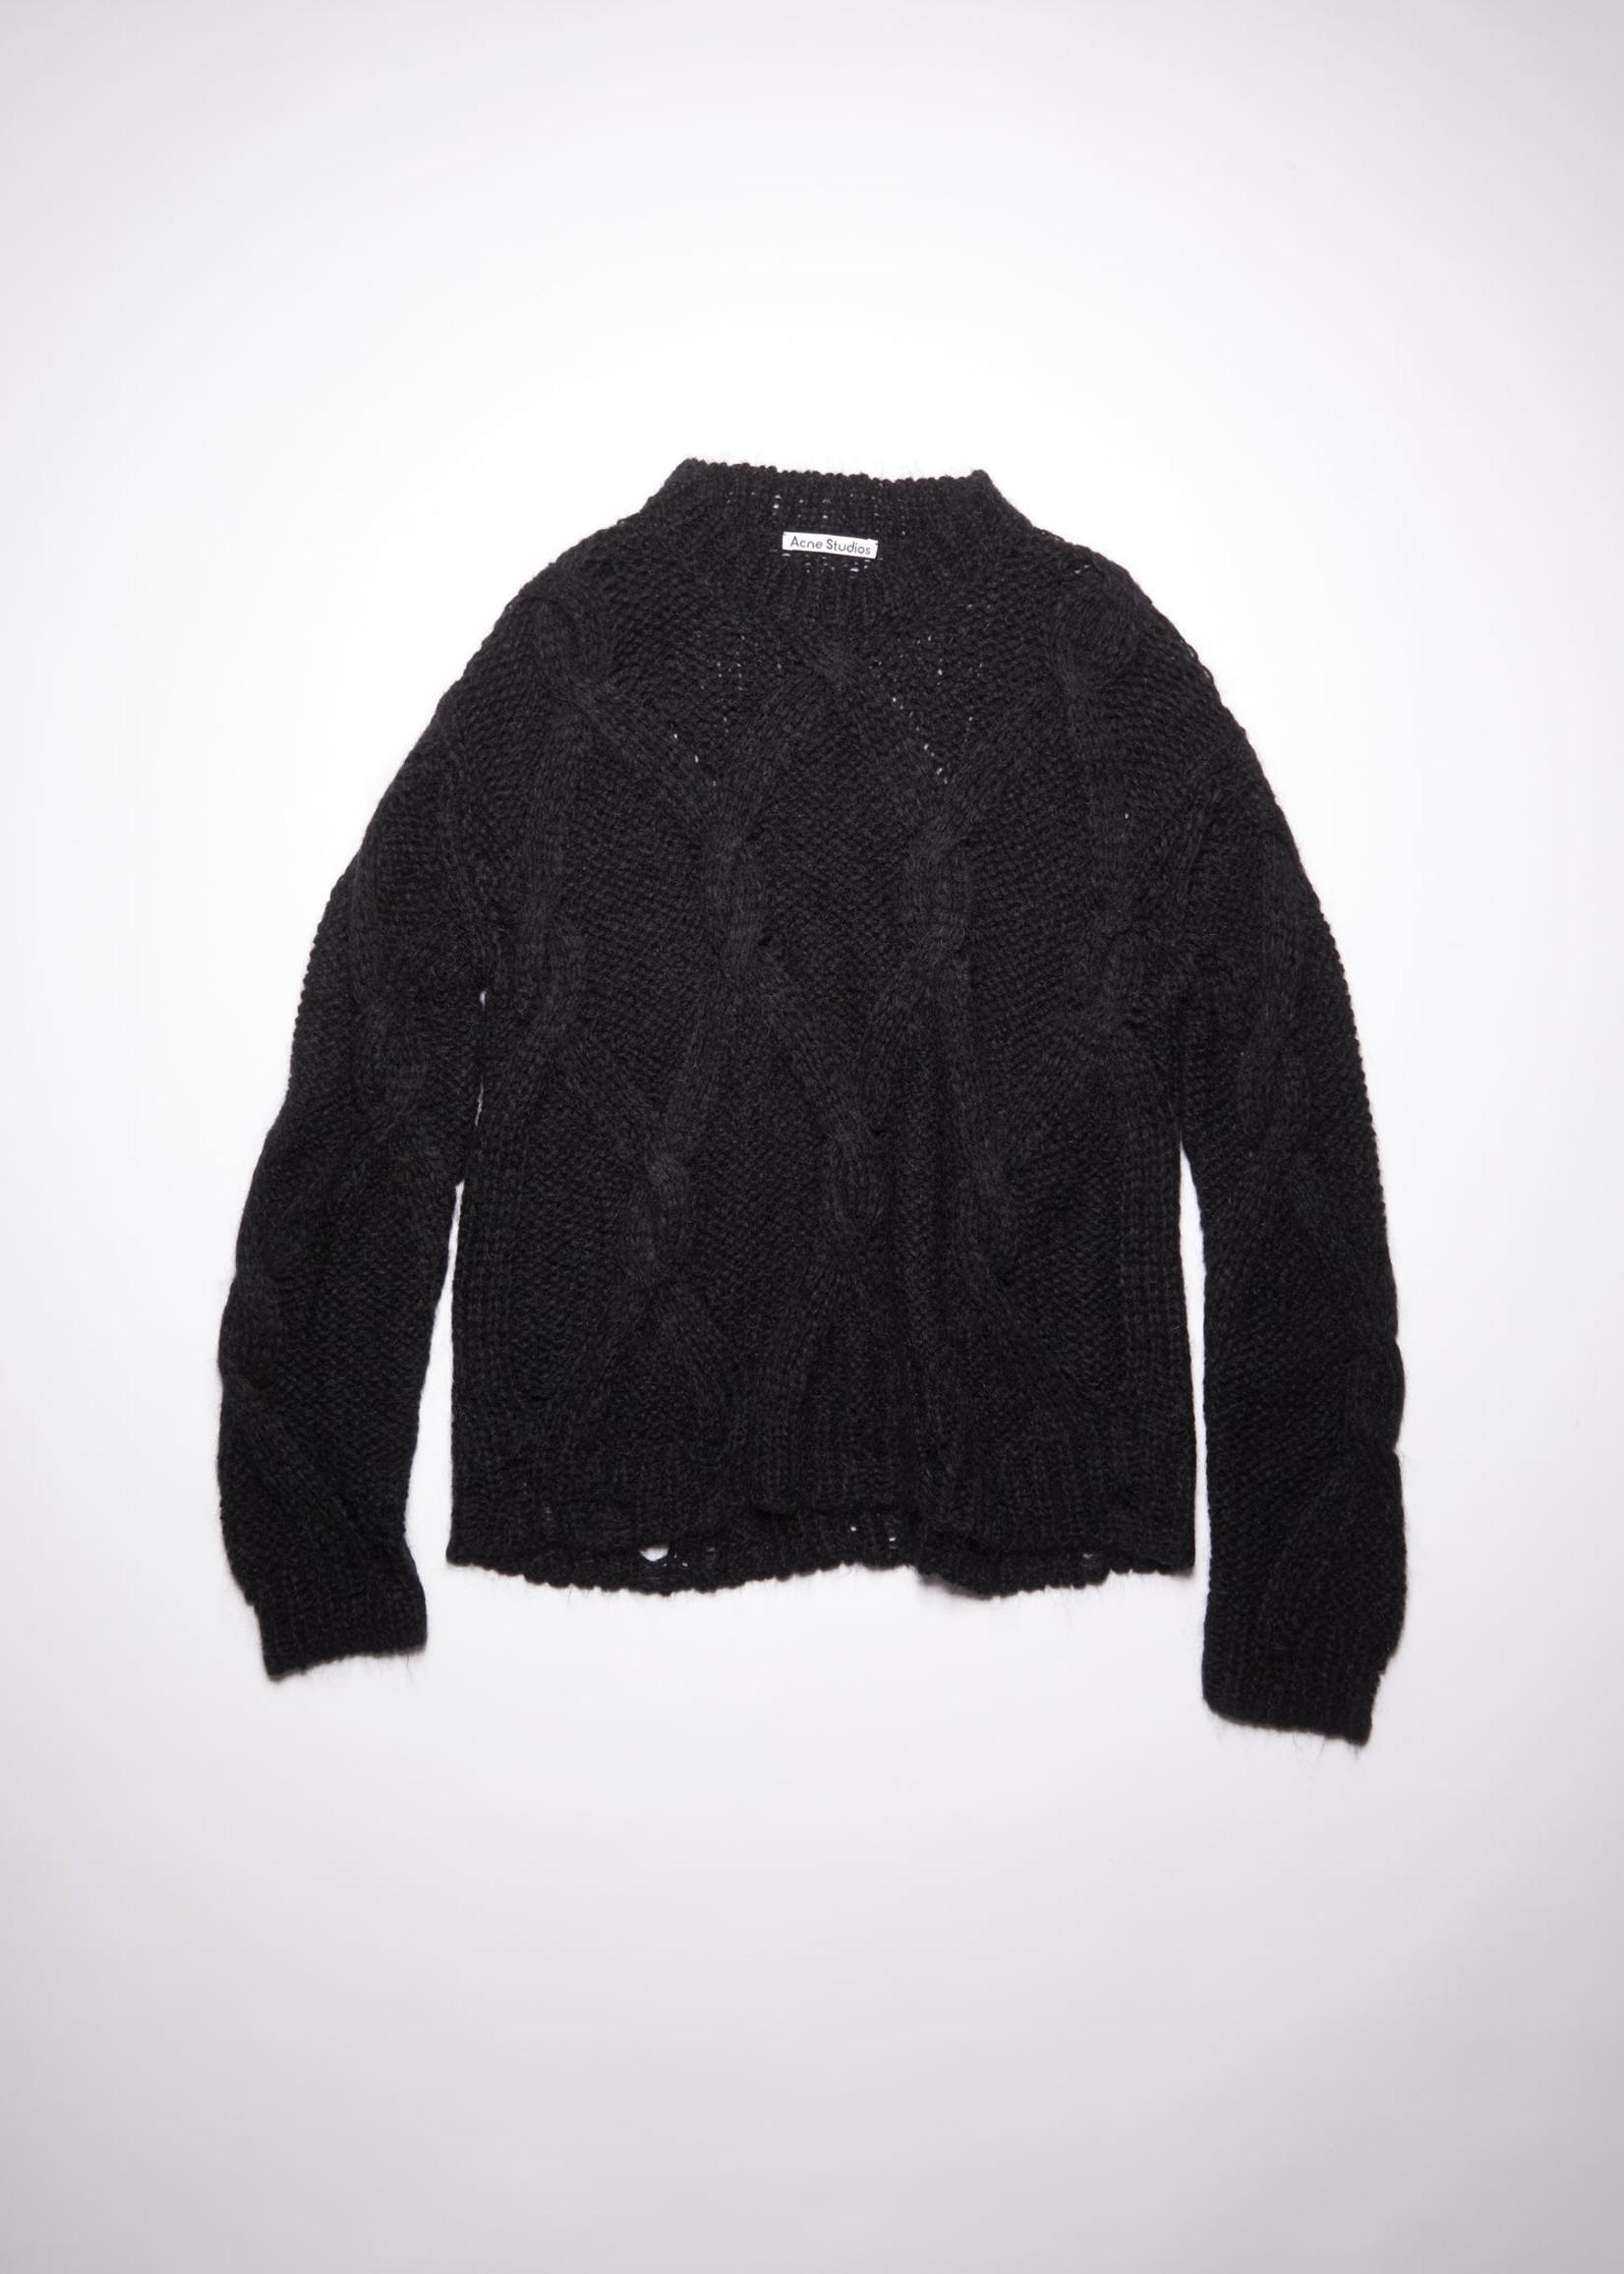 Acnestudios Acnestudios  chunky knit black